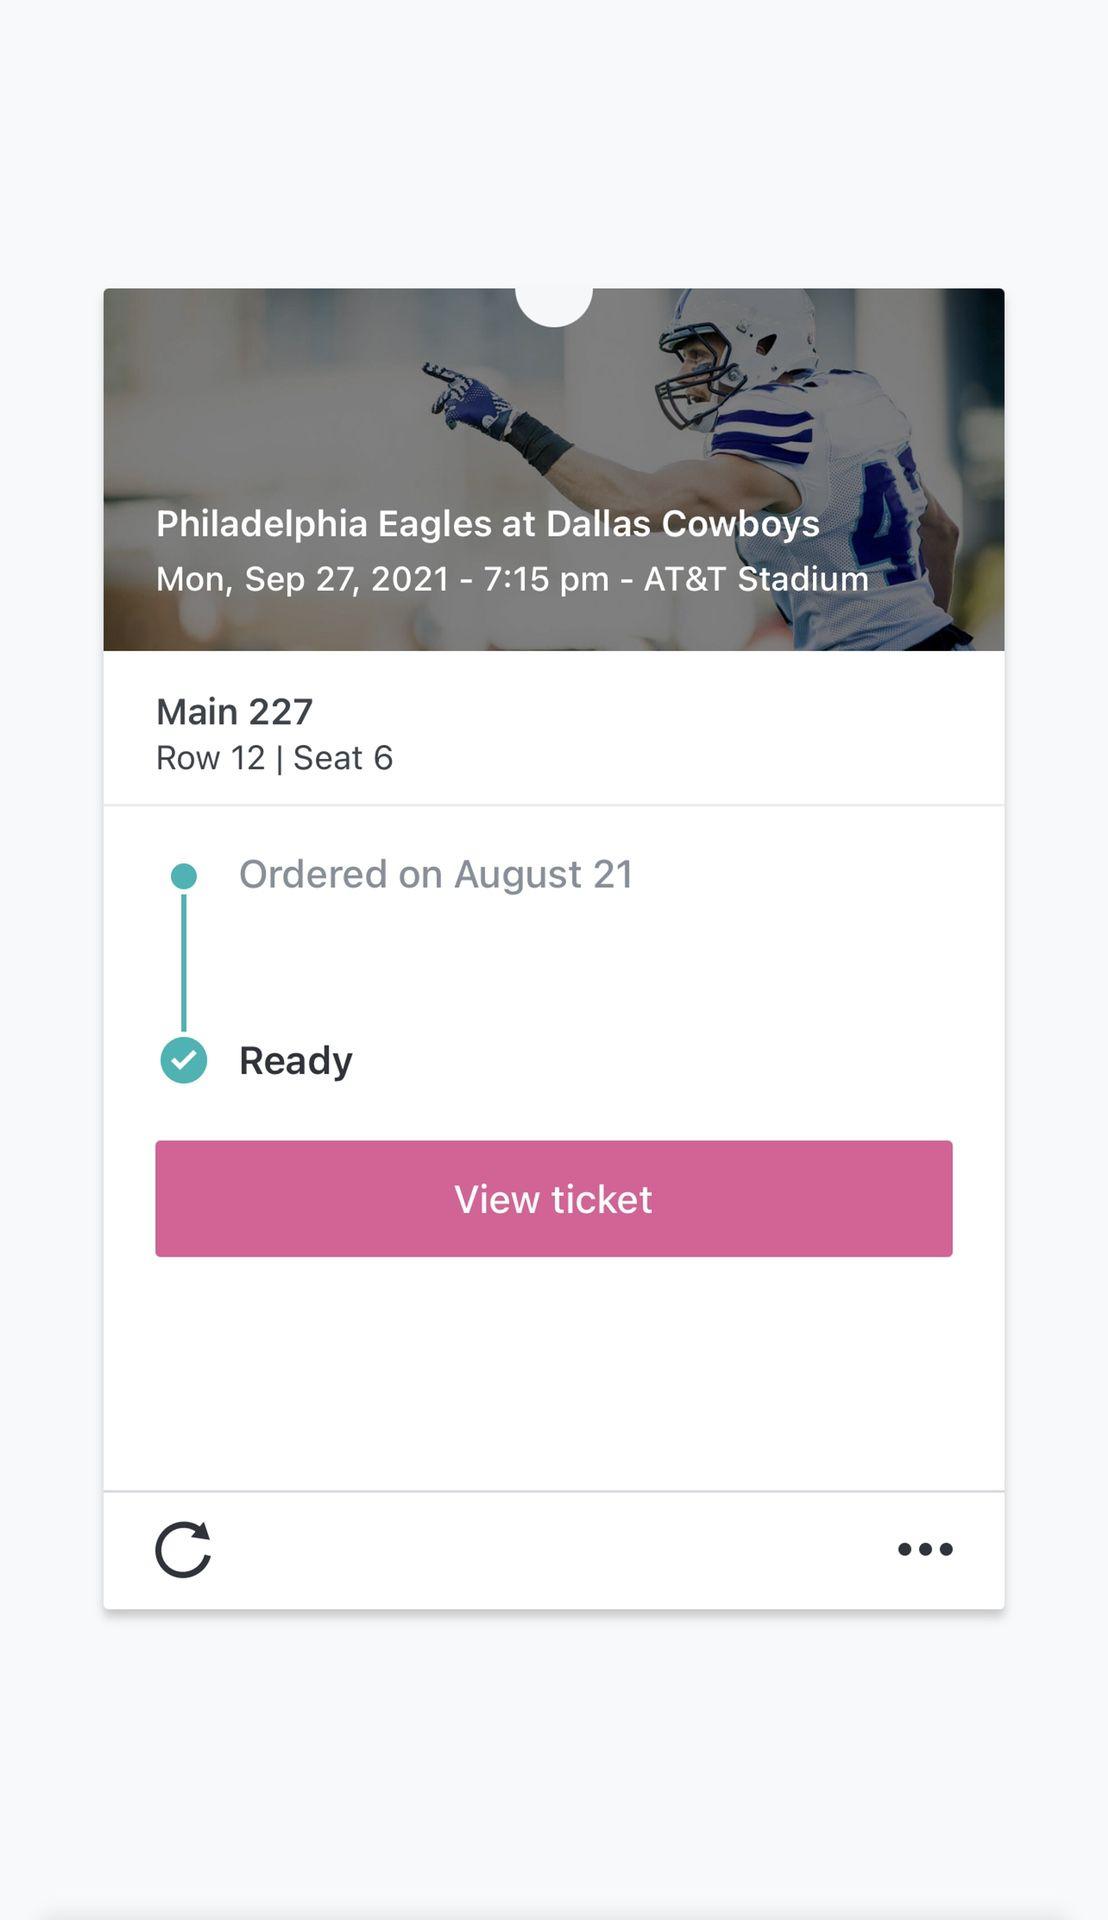 Cowboys Vs Eagles Sep 27th 2021